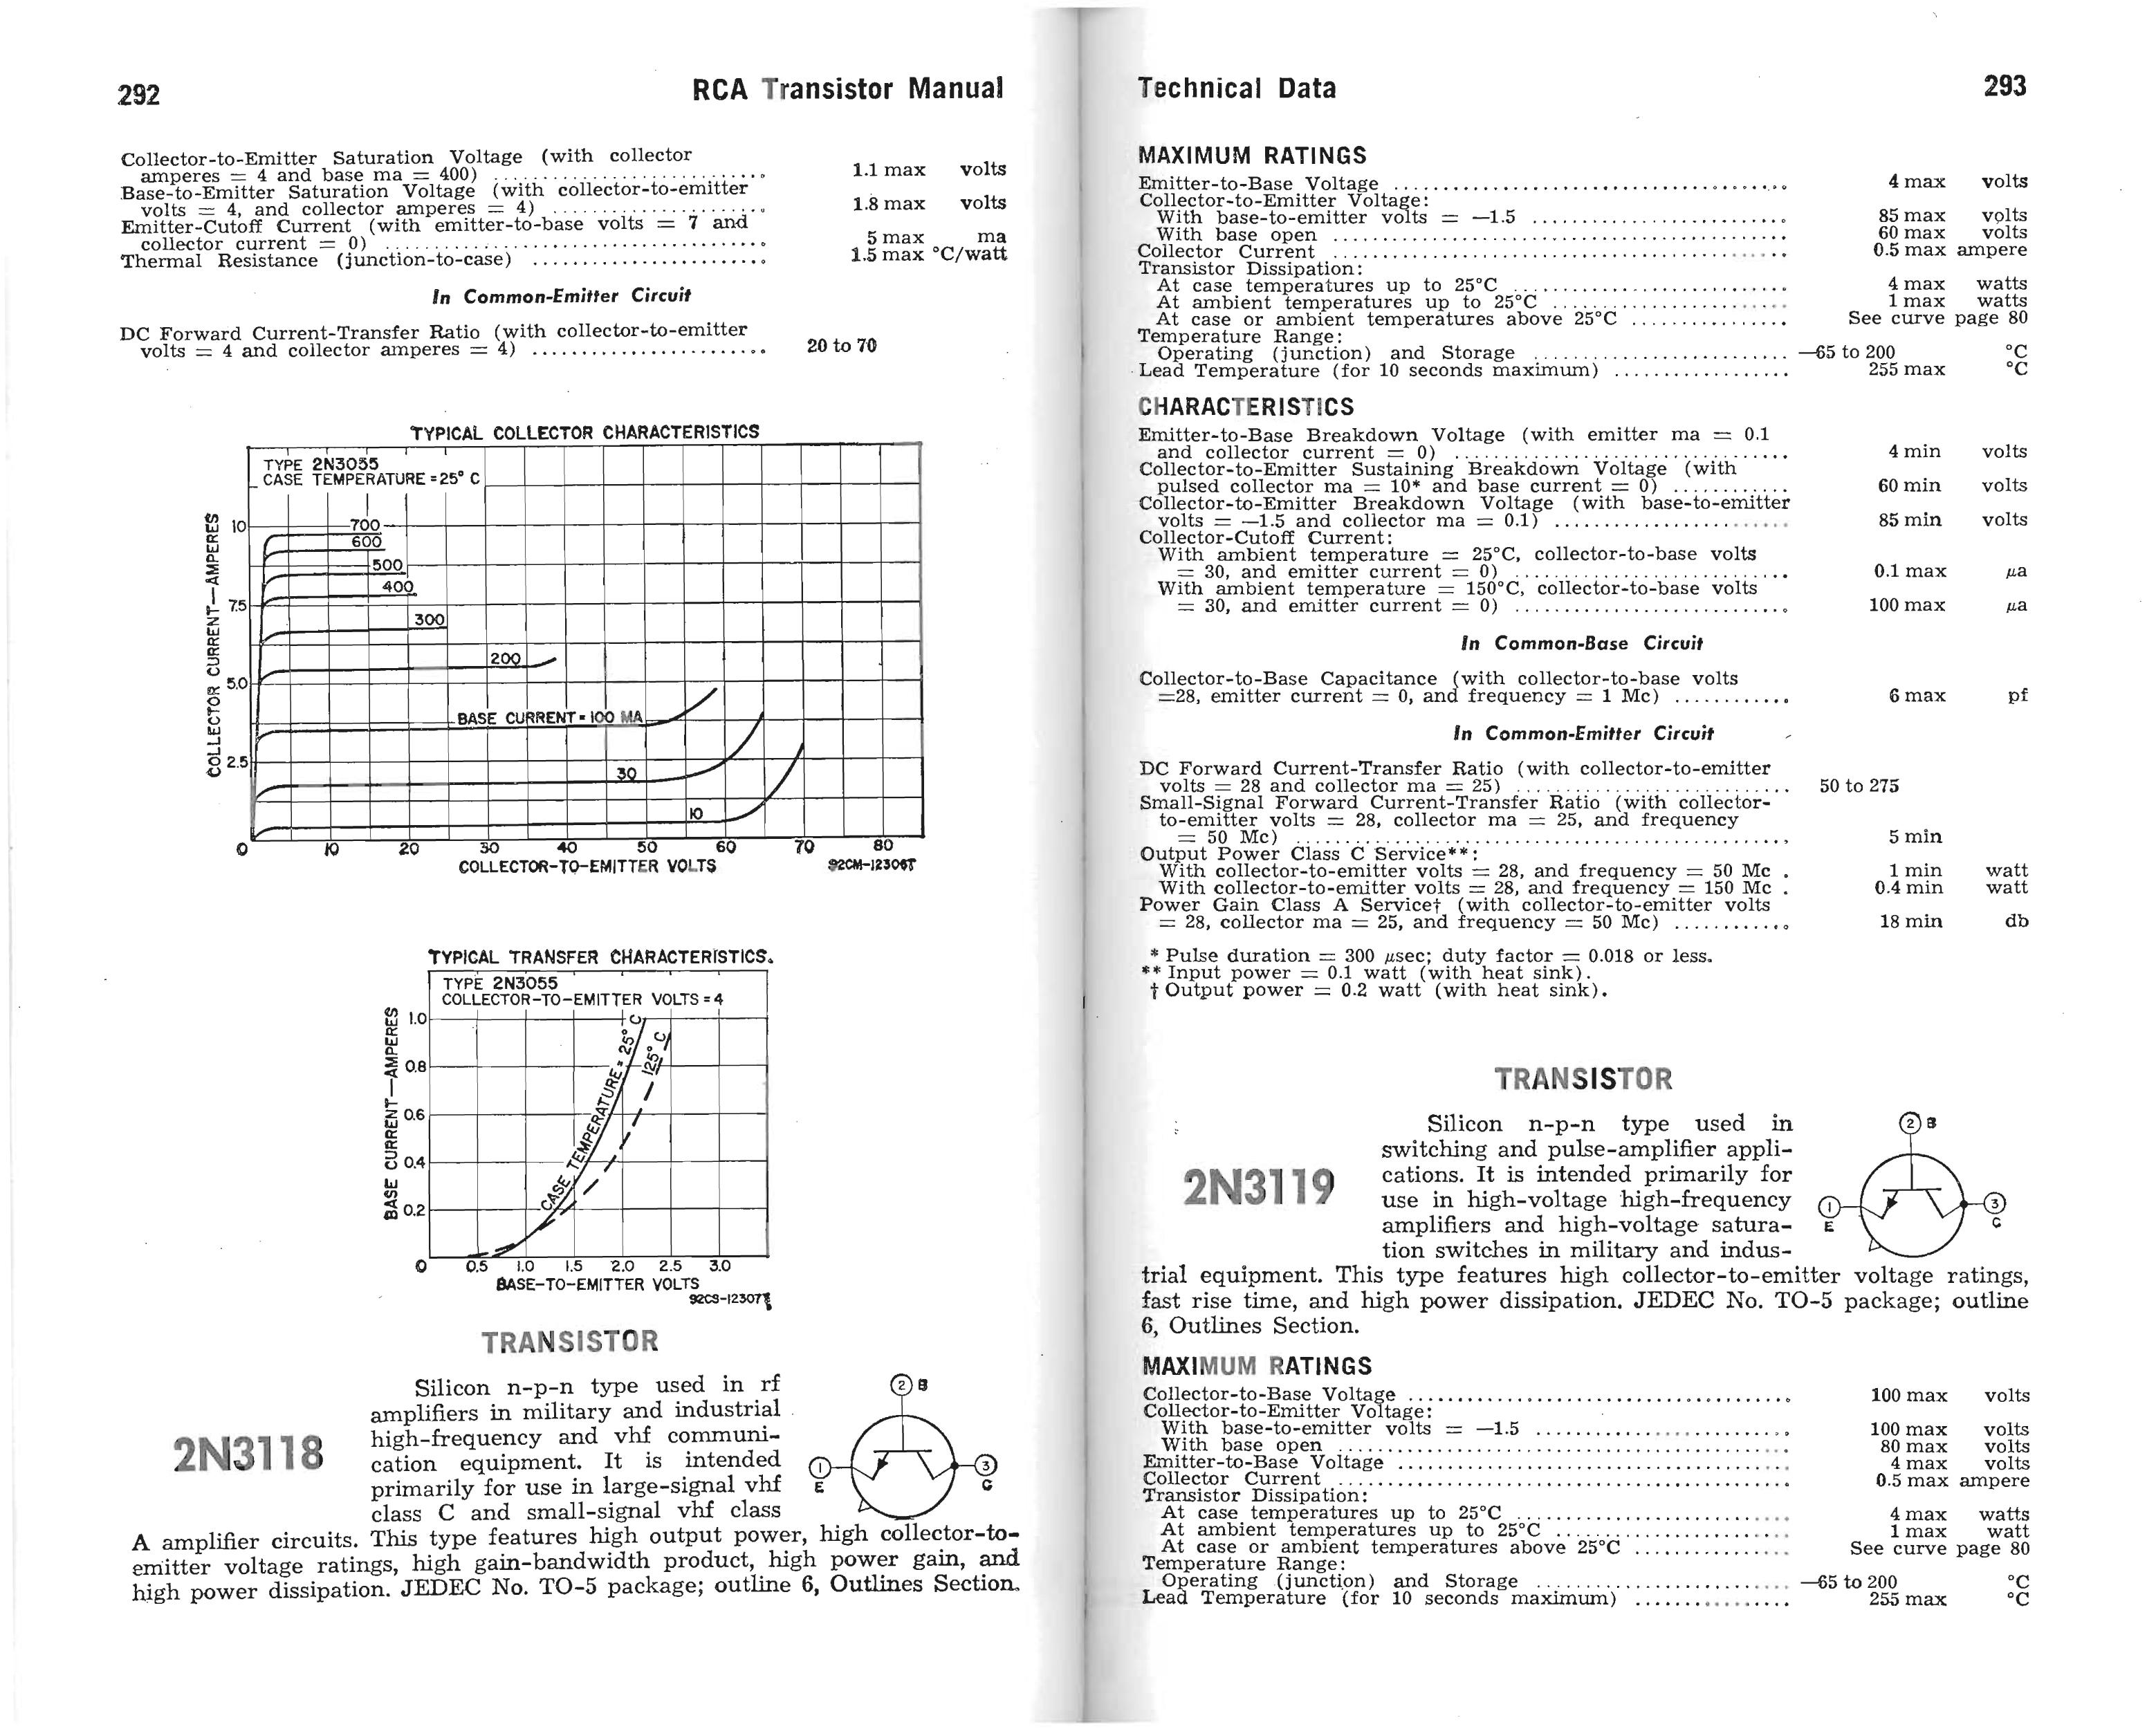 the rca 2n3055 transistor